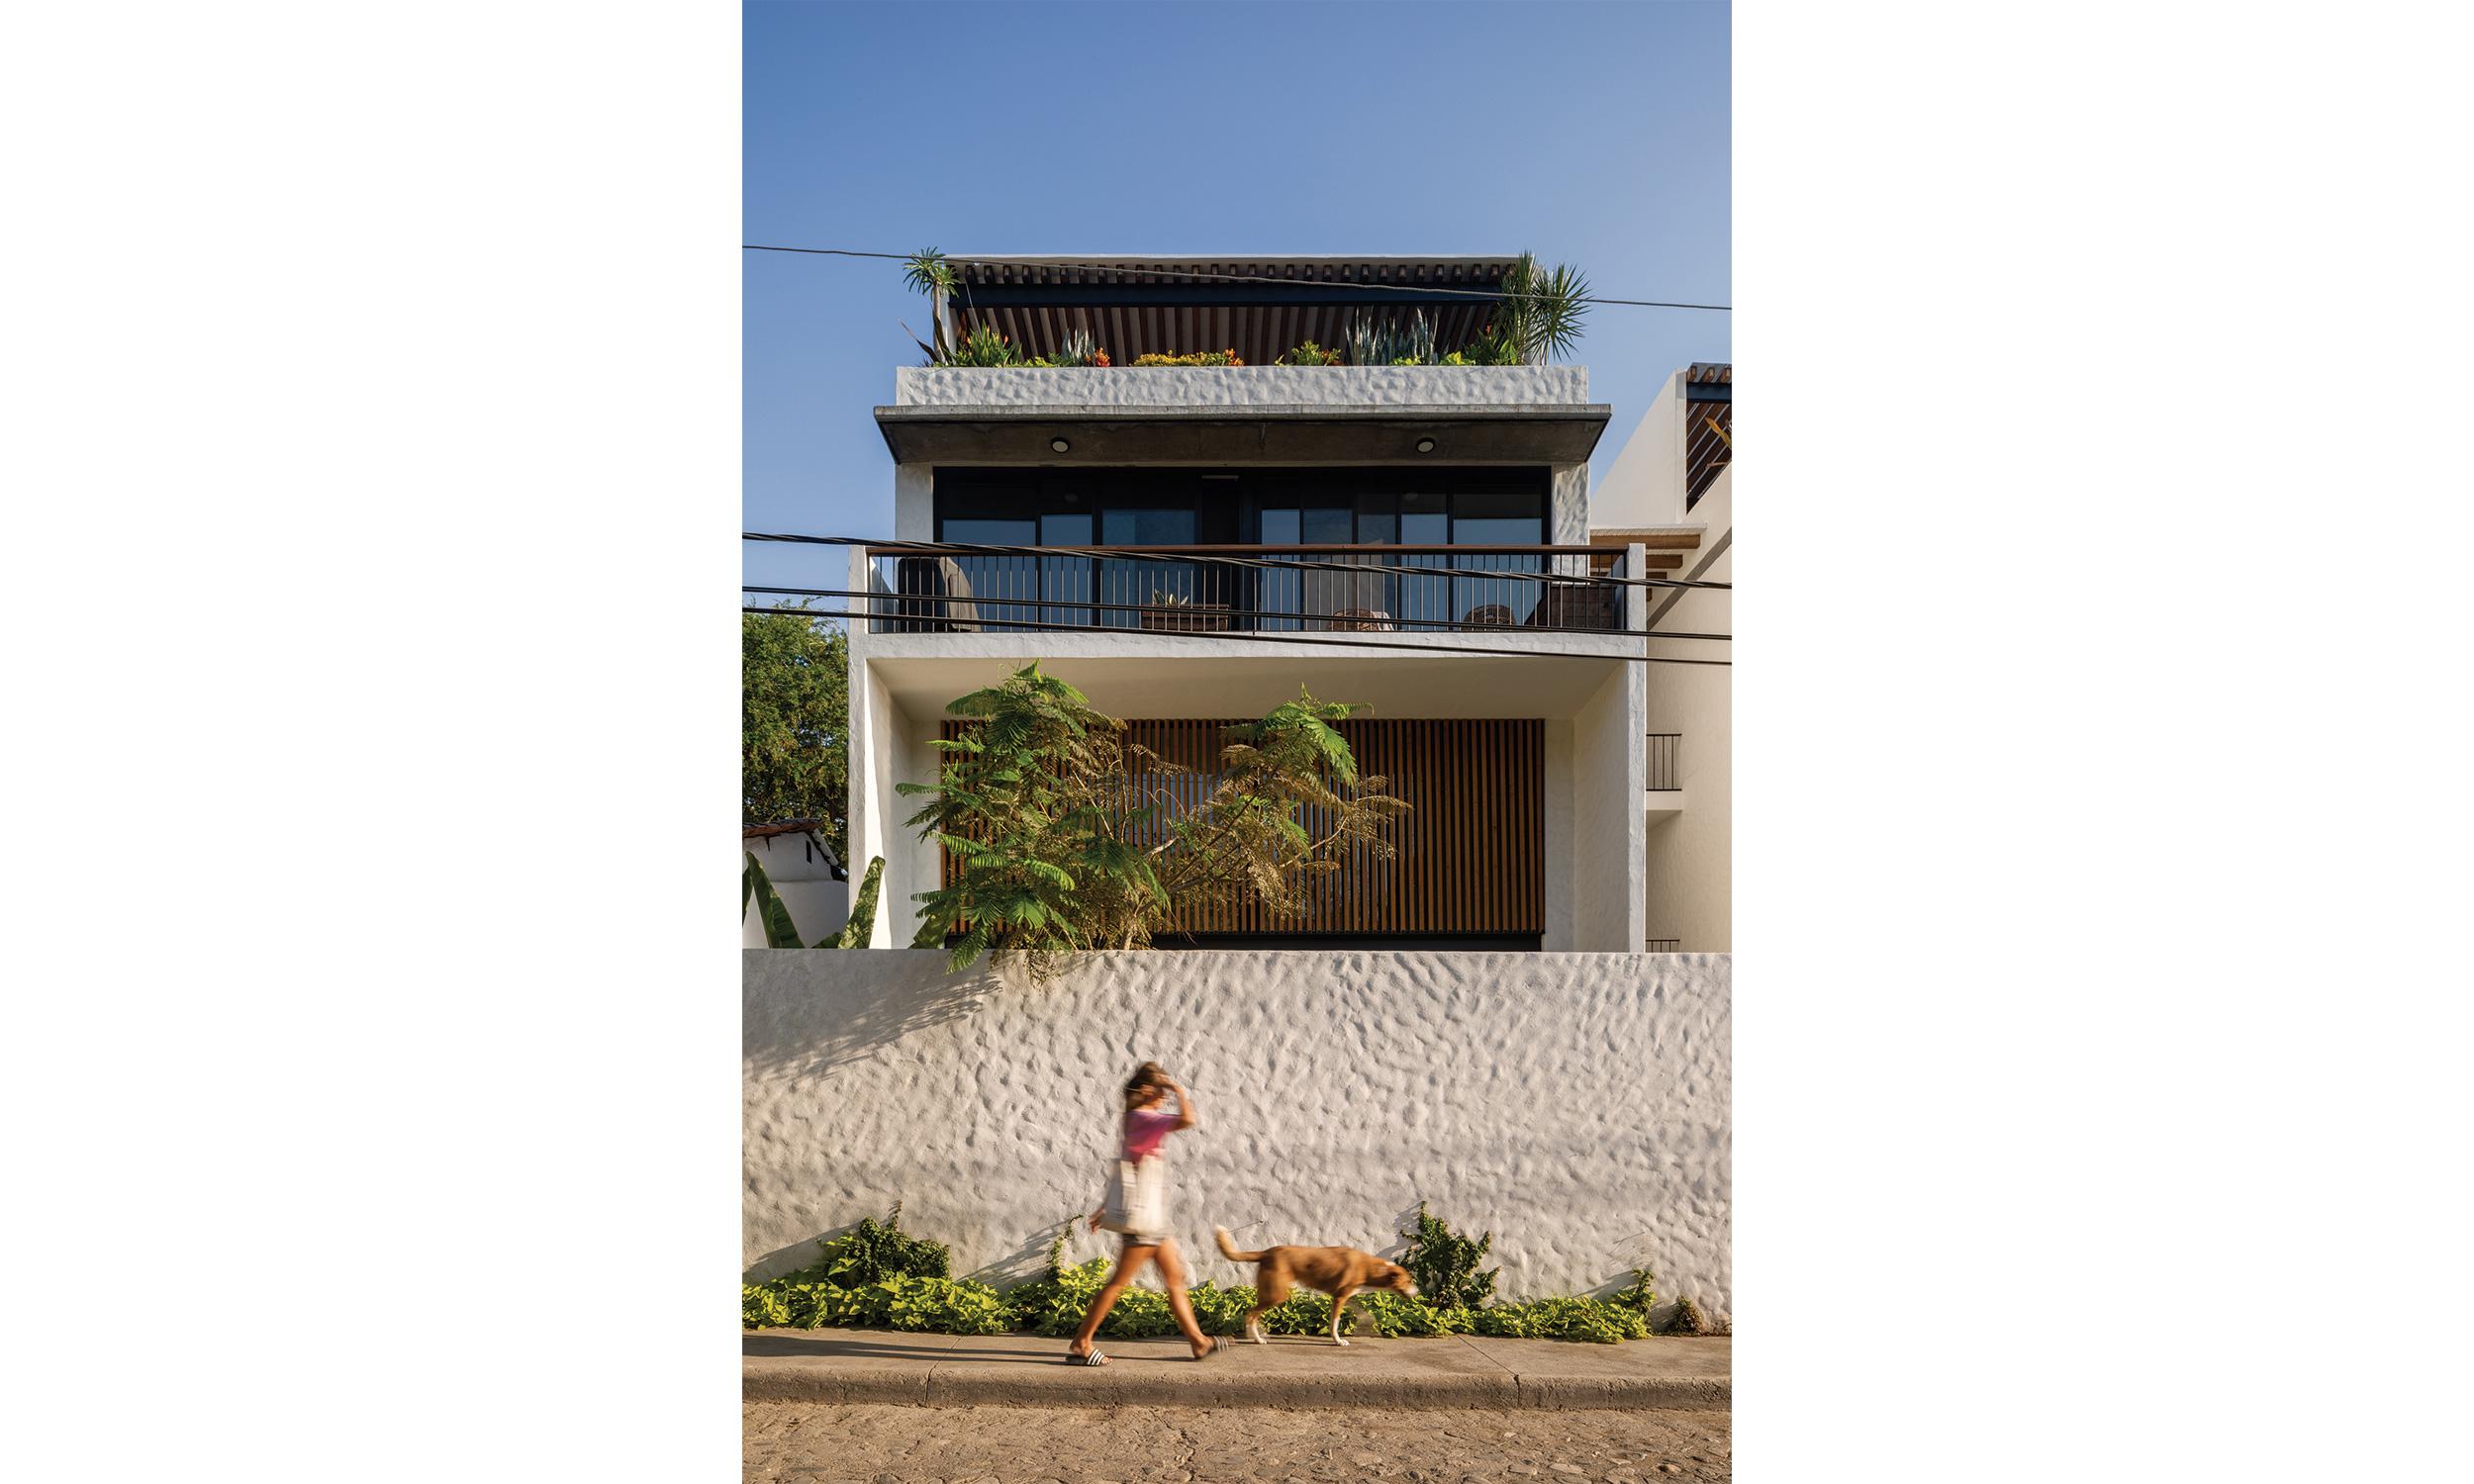 main_office_casa_galería_rafaél_gamo_1065_front_view